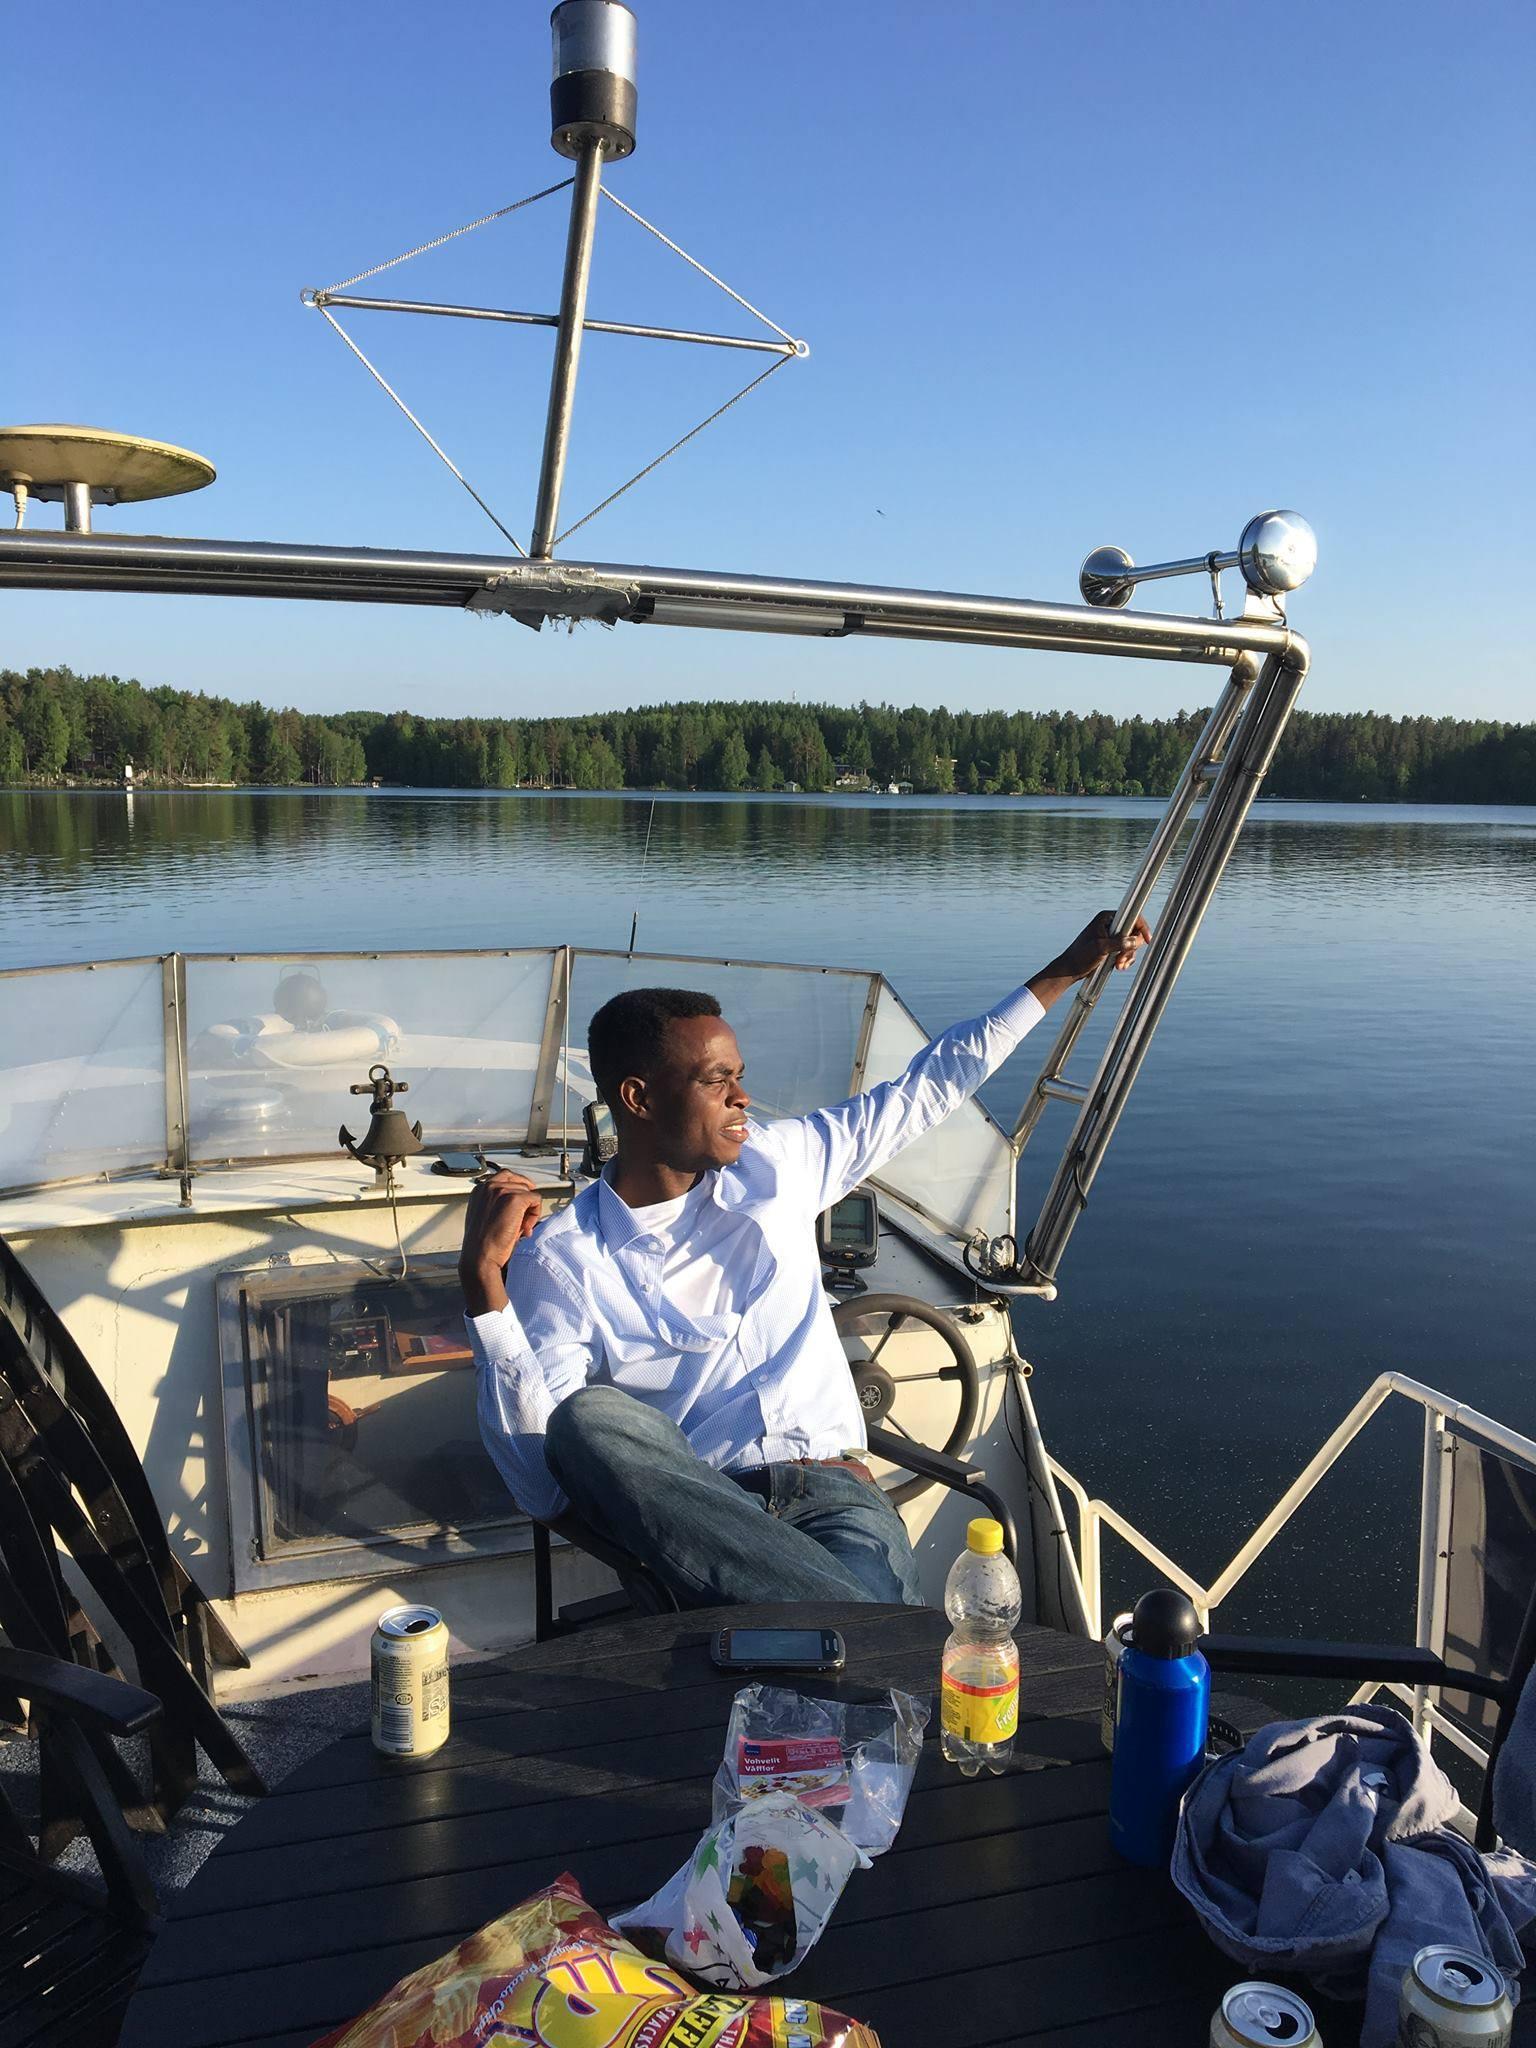 Student Success Story of Adeyinka from Nigeria